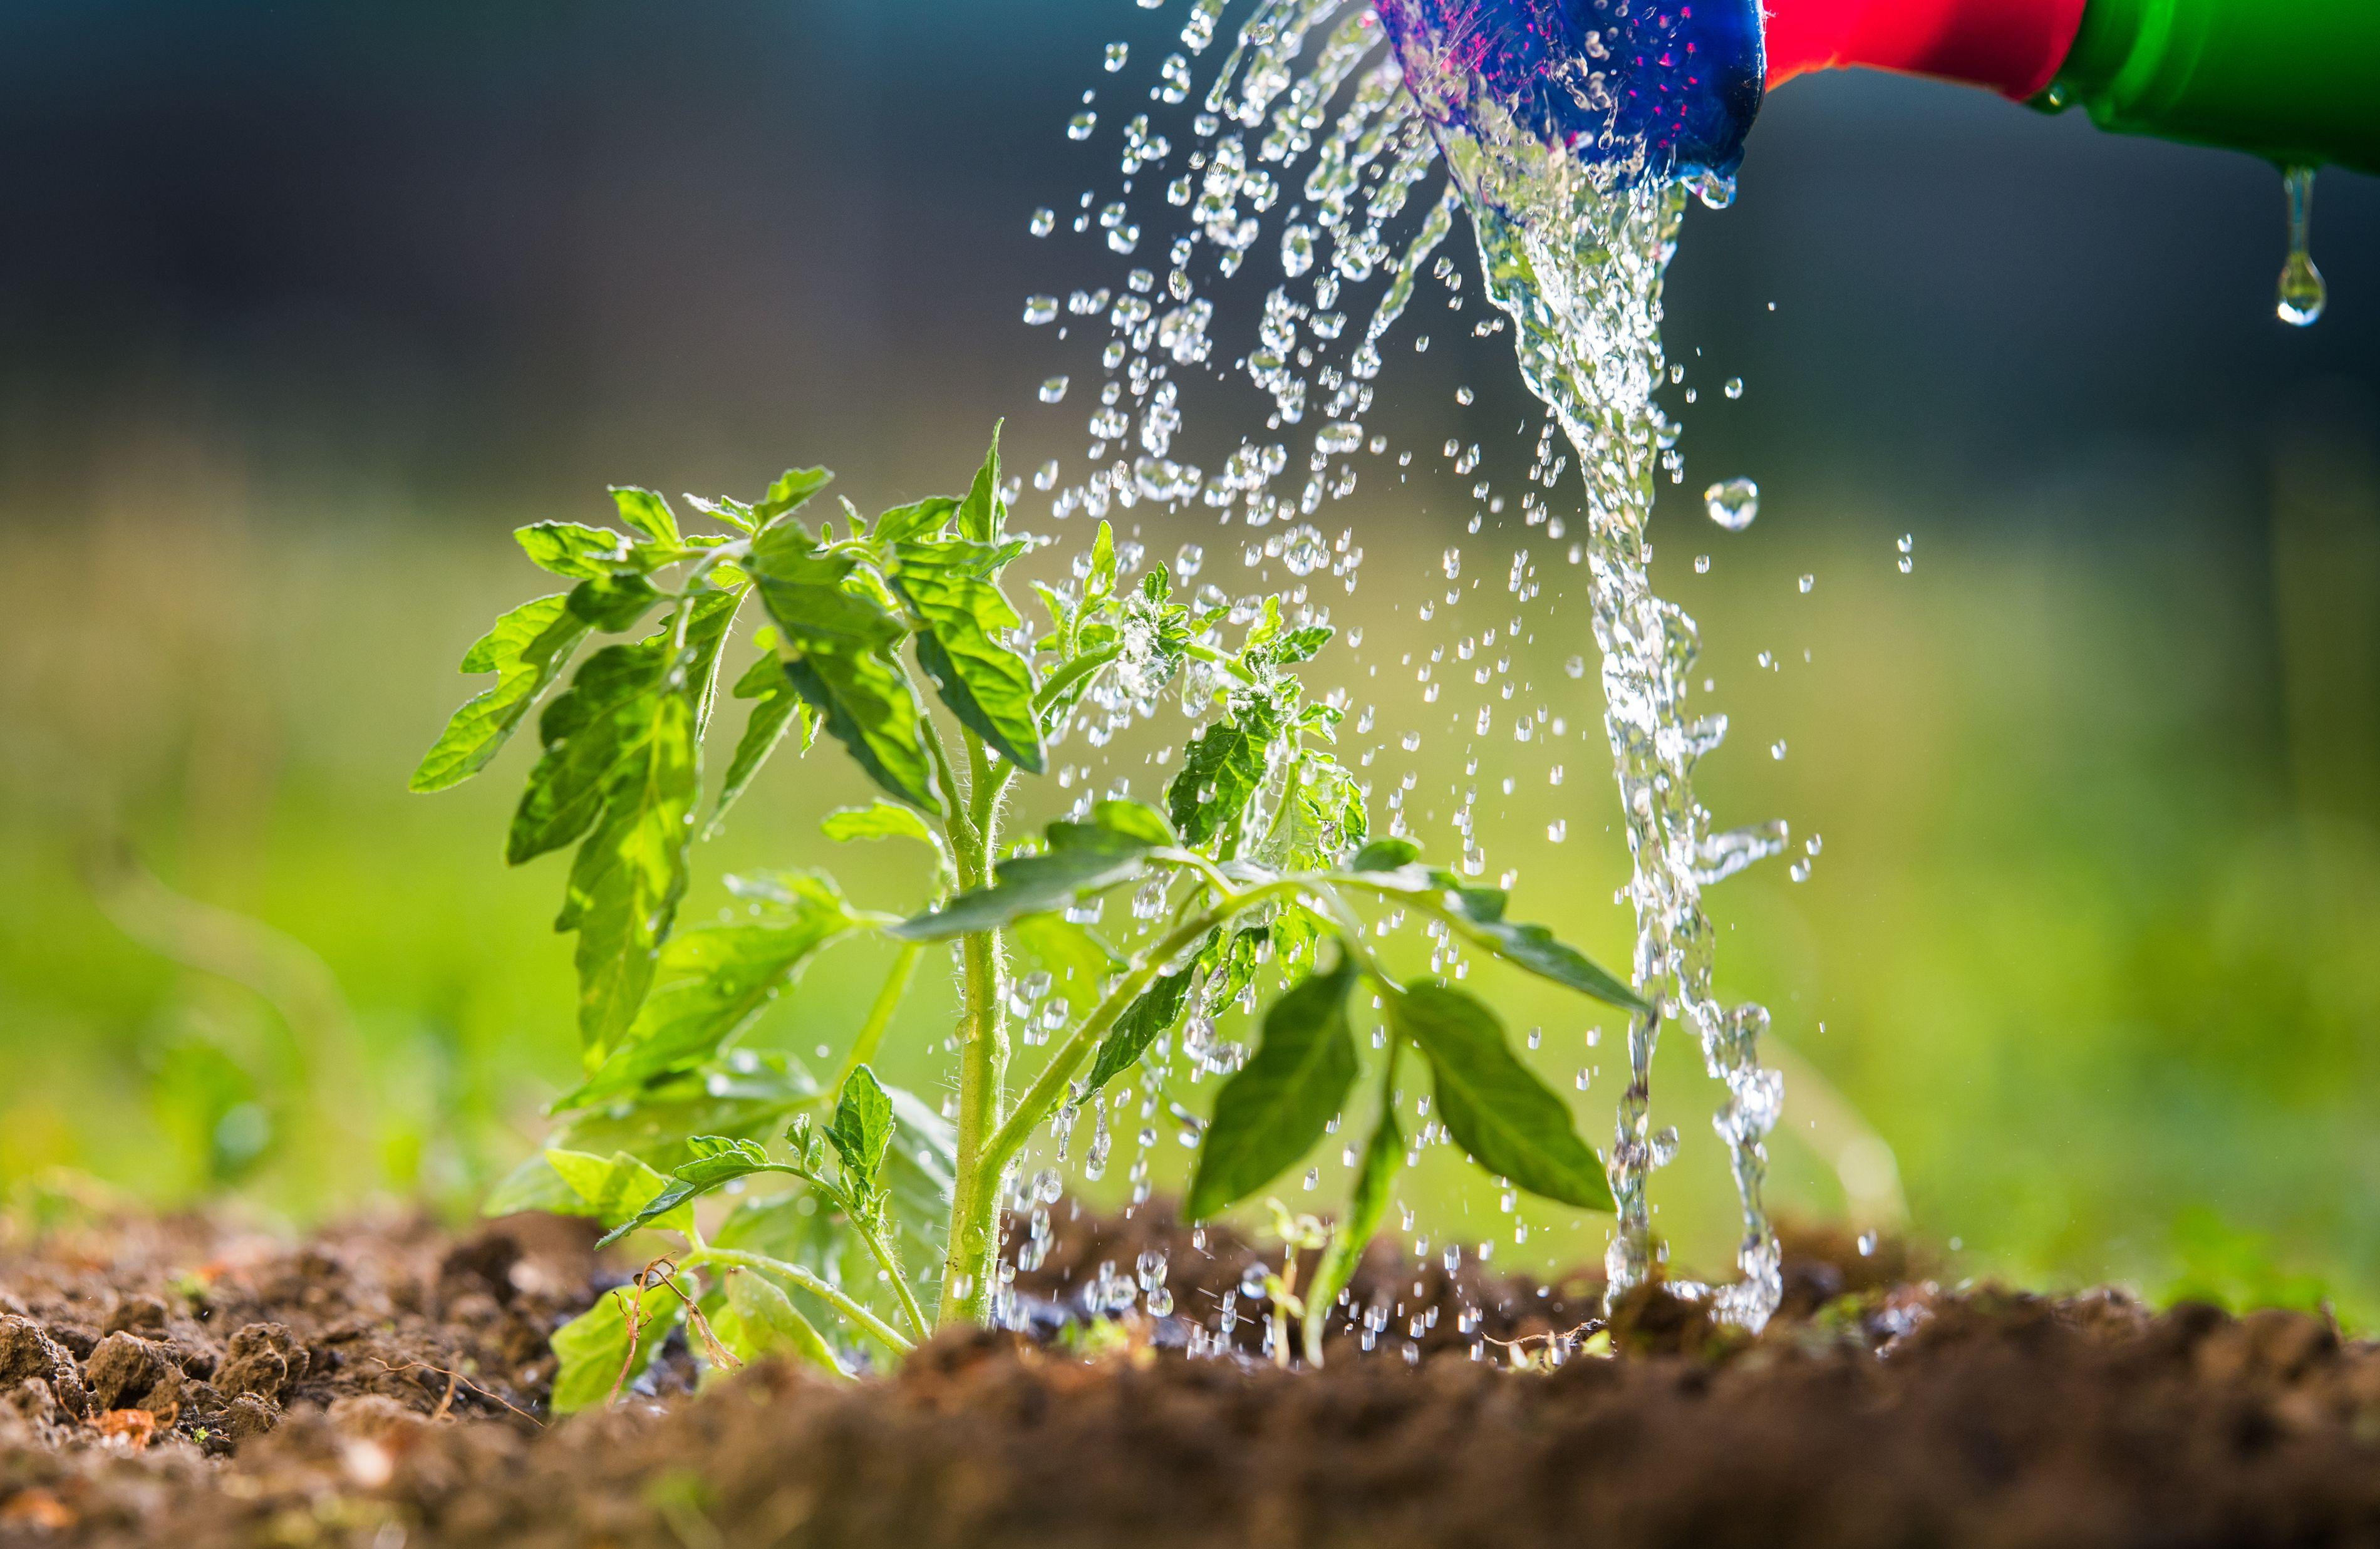 How to water your vegetable garden